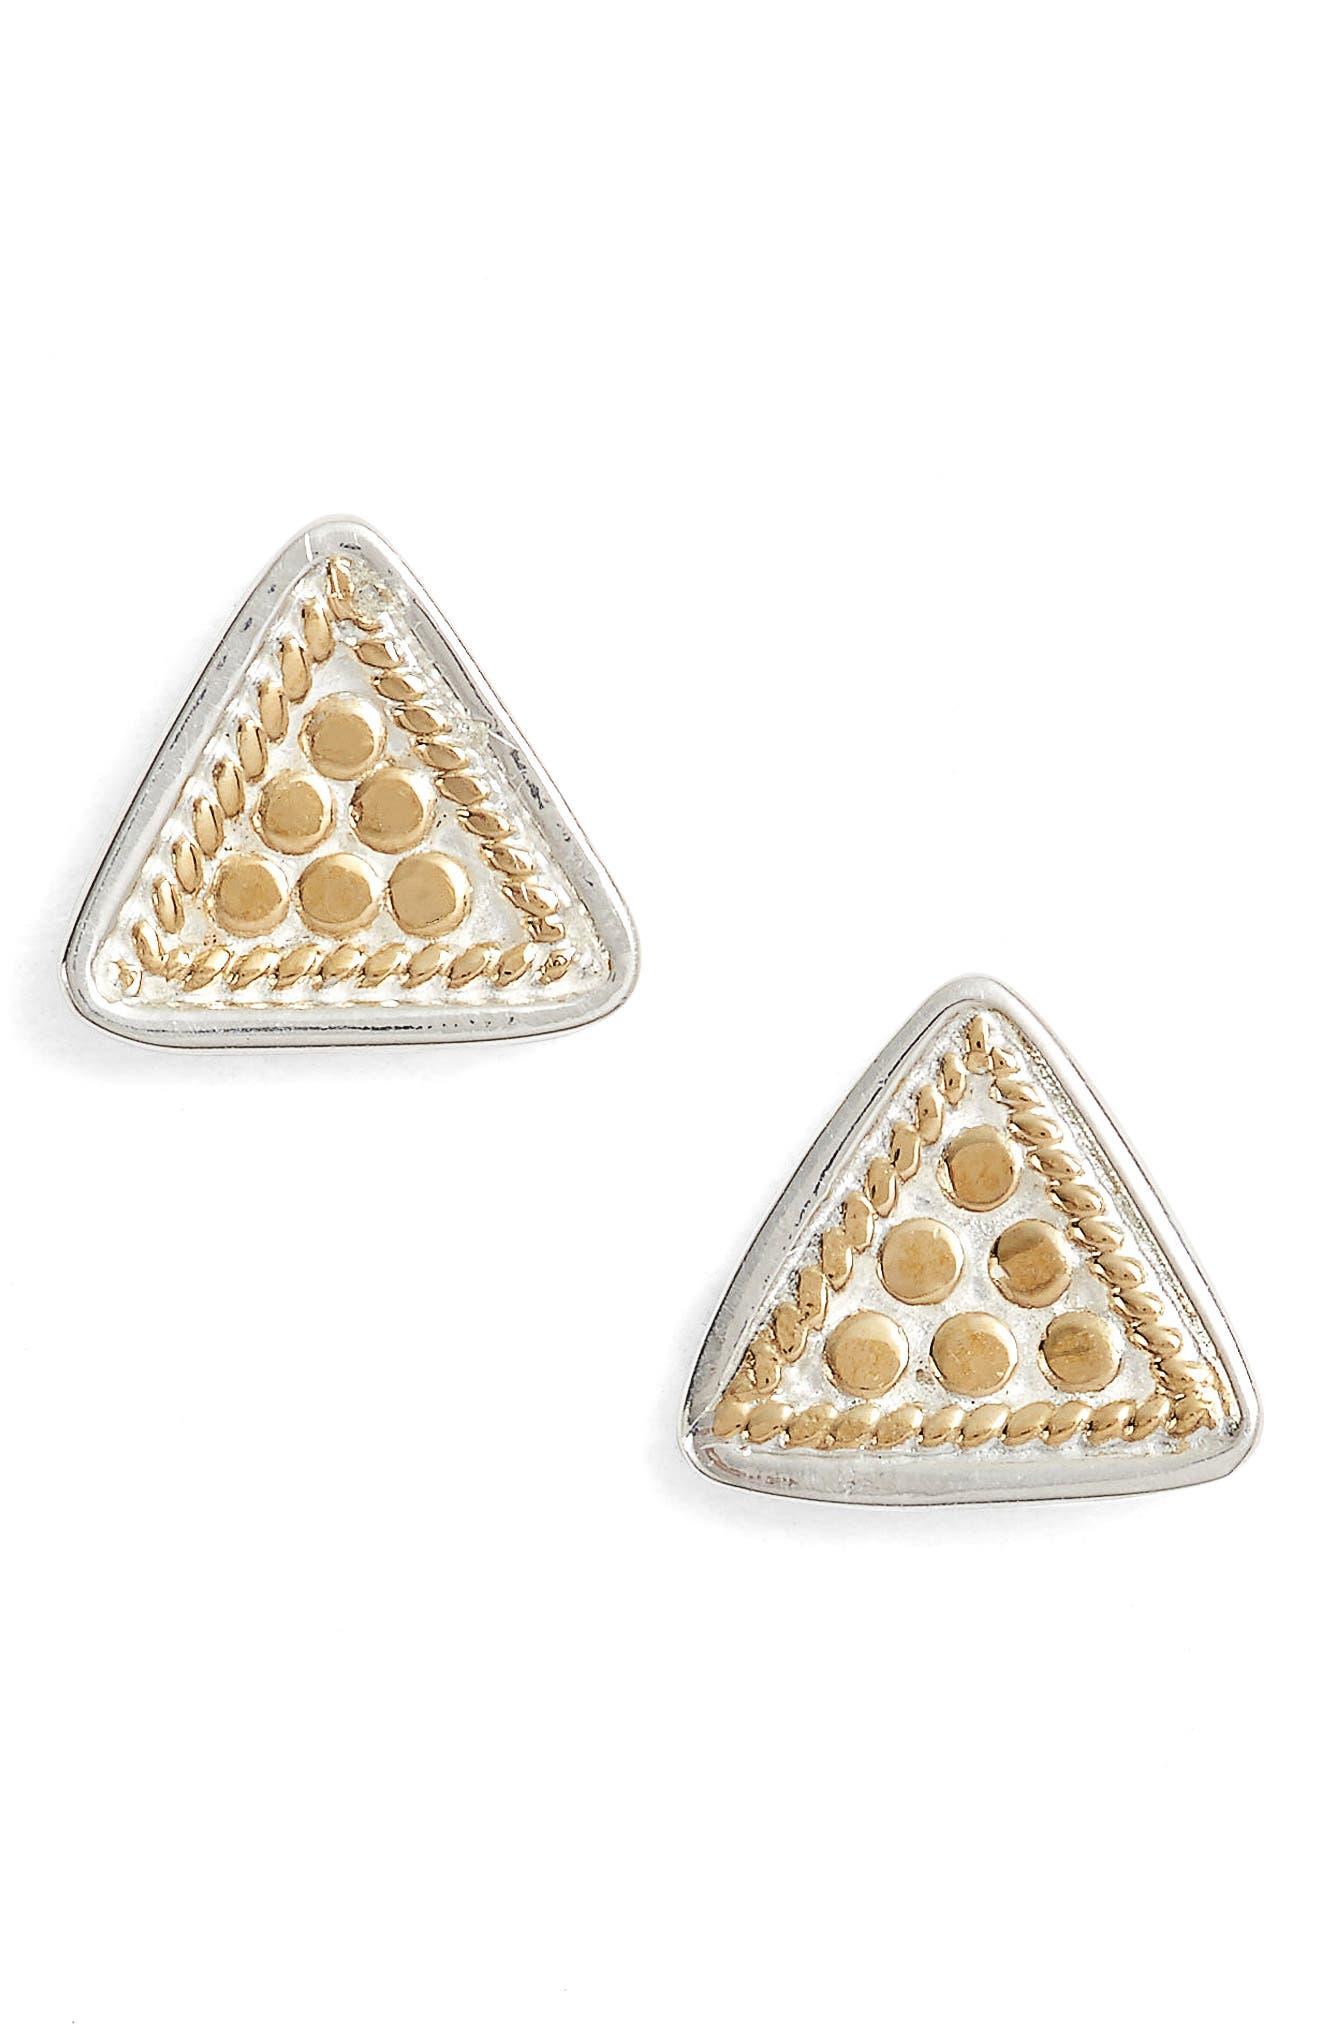 Main Image - Anna Beck Mini Triangle Stud Earrings